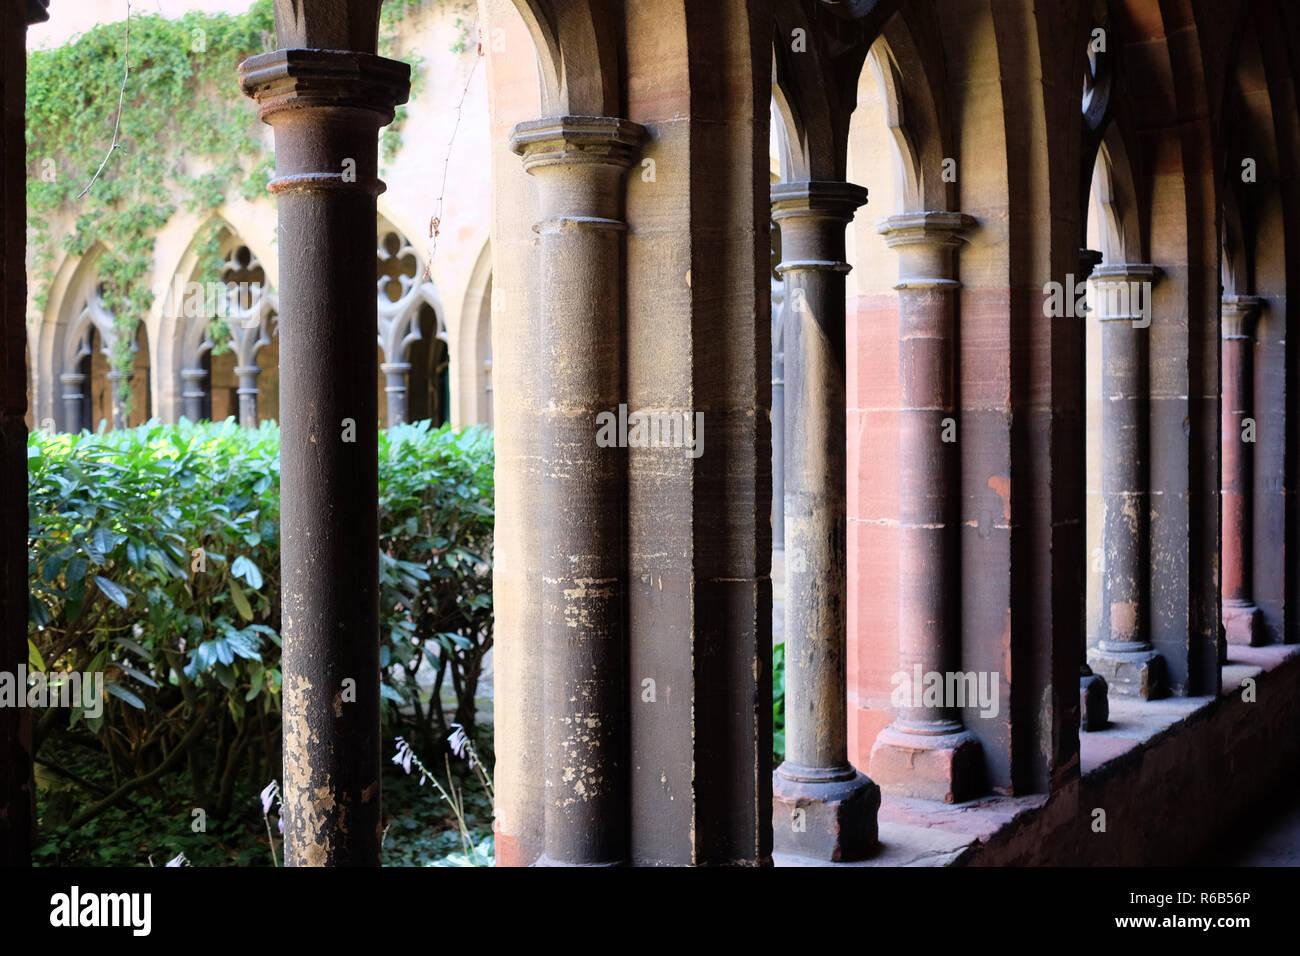 MUSEÉ UNTERLINDEN . MUSEUM UNTERLINDEN . COLMAR - Stock Image